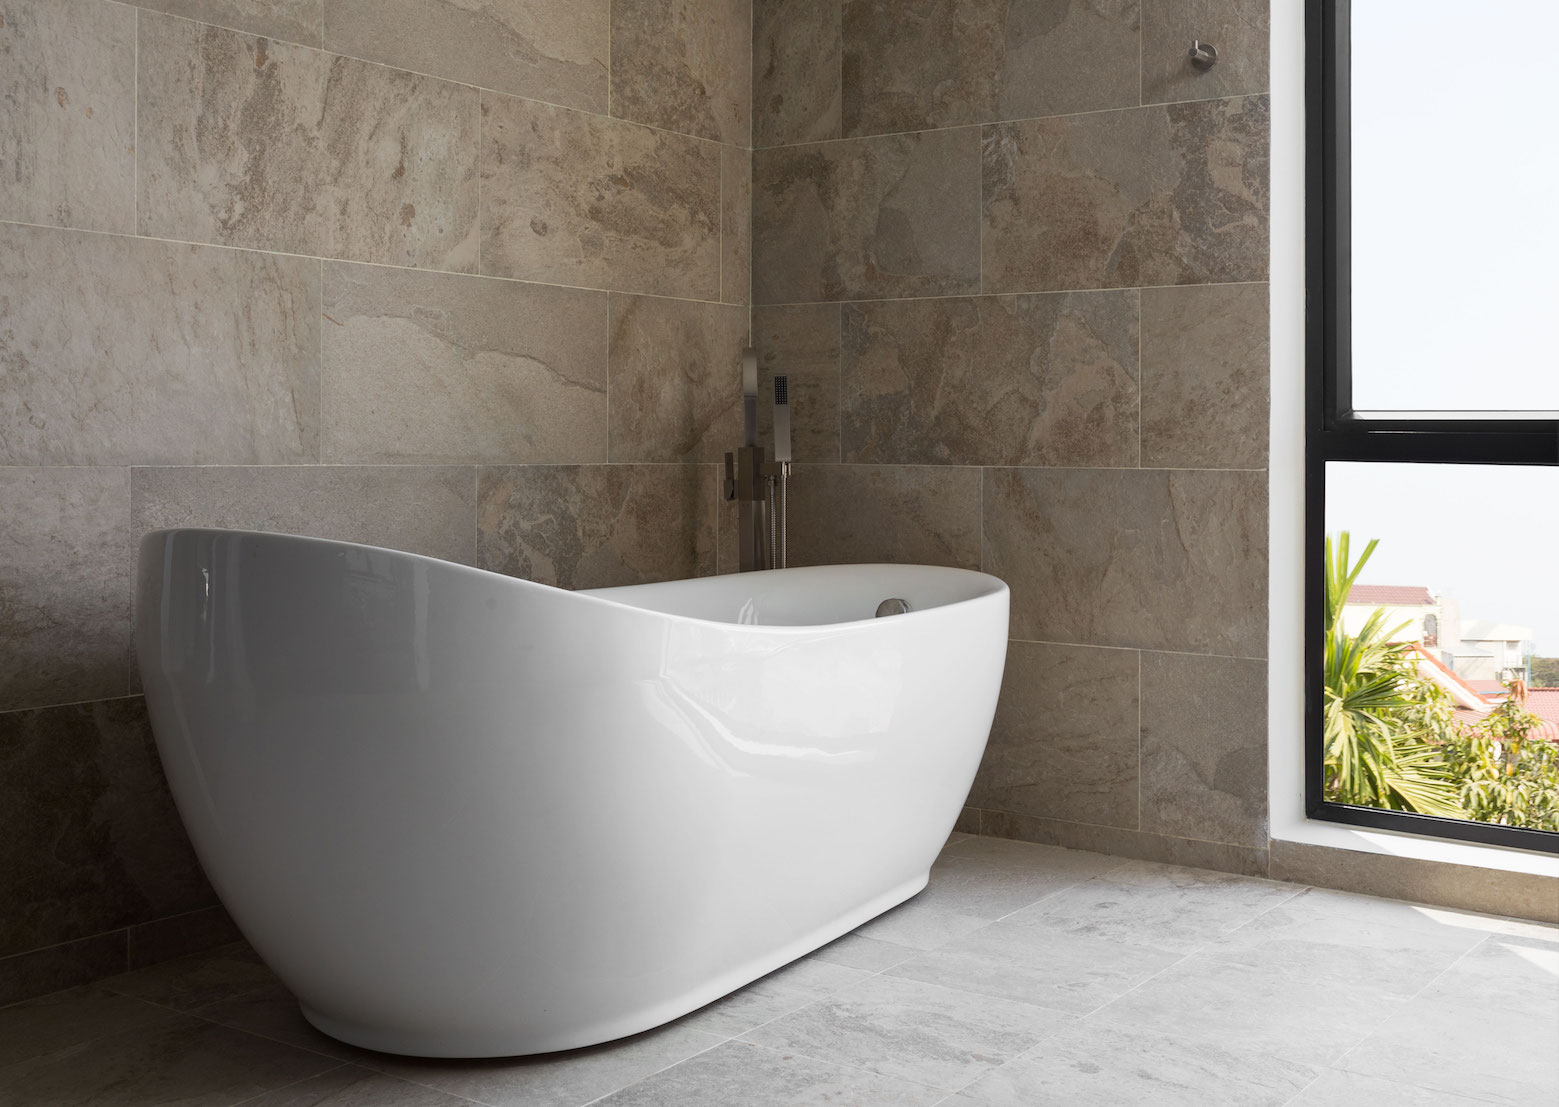 3-bed-duplex-bath-habitat-condos-family-property-phnom-penh.jpg